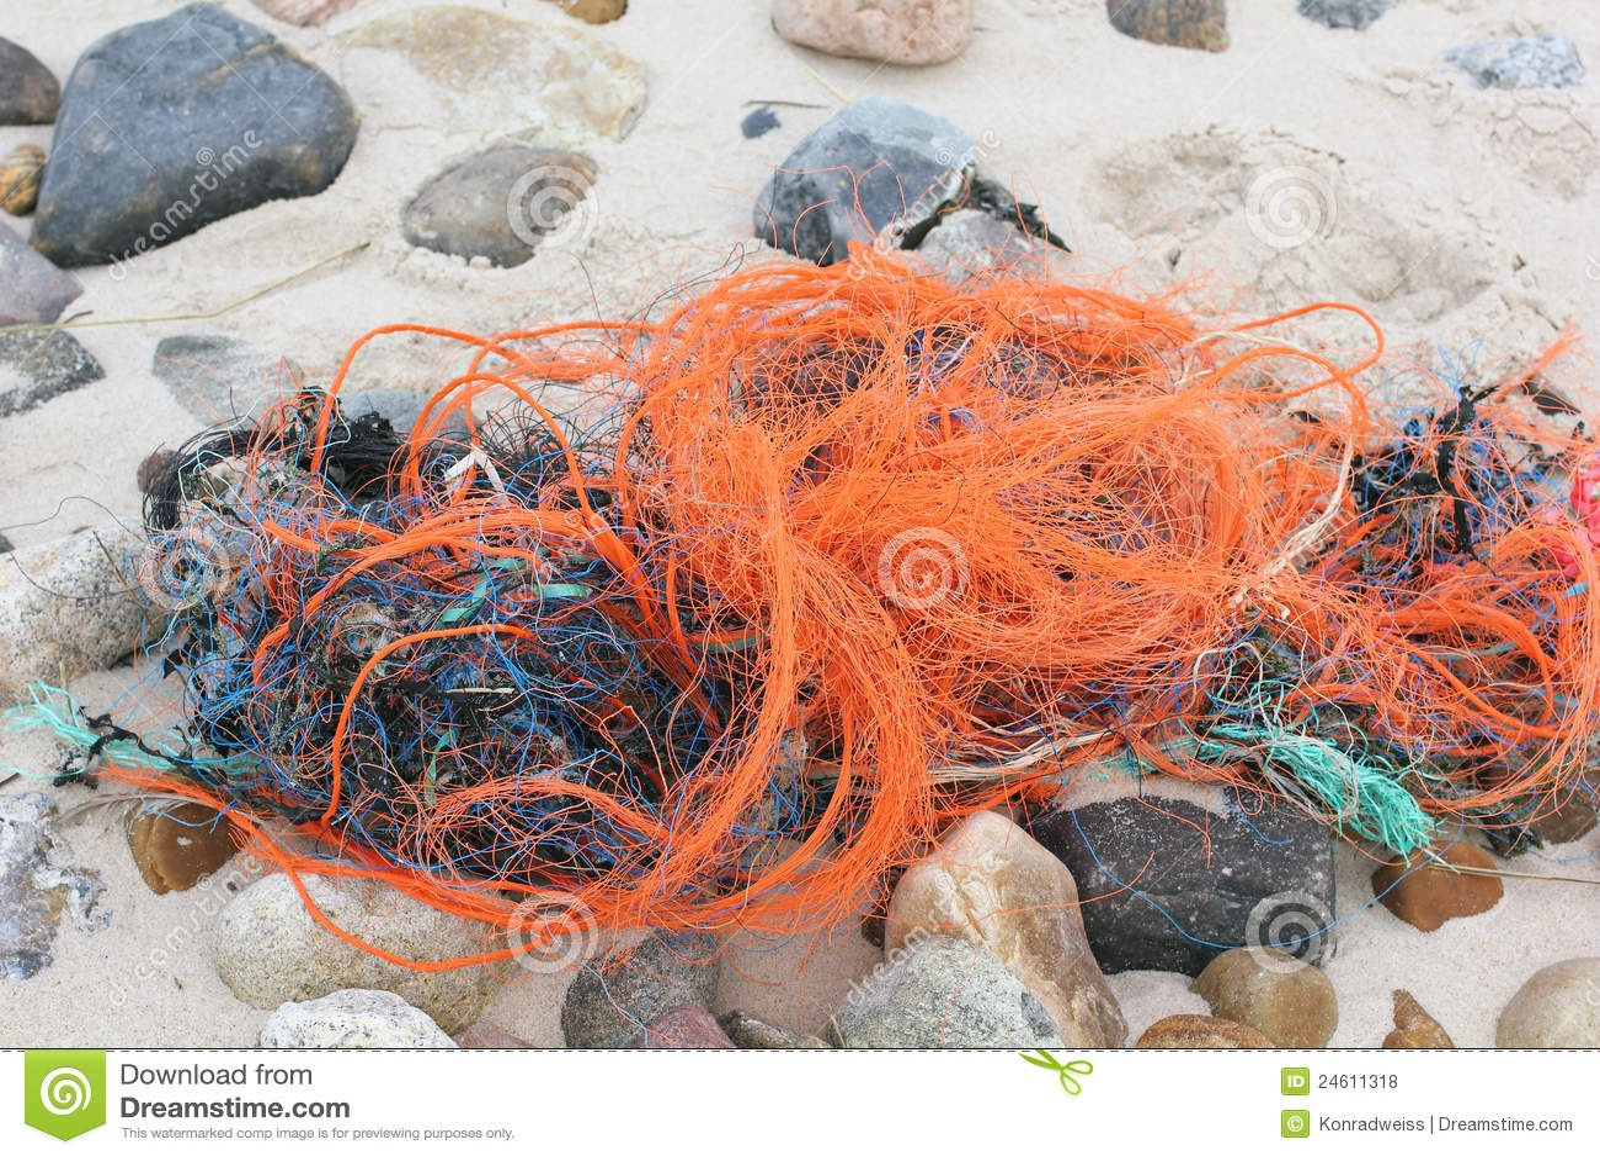 Plastikabfall Auf Dem Strand Stockfoto Bild Von Ozean Abfall